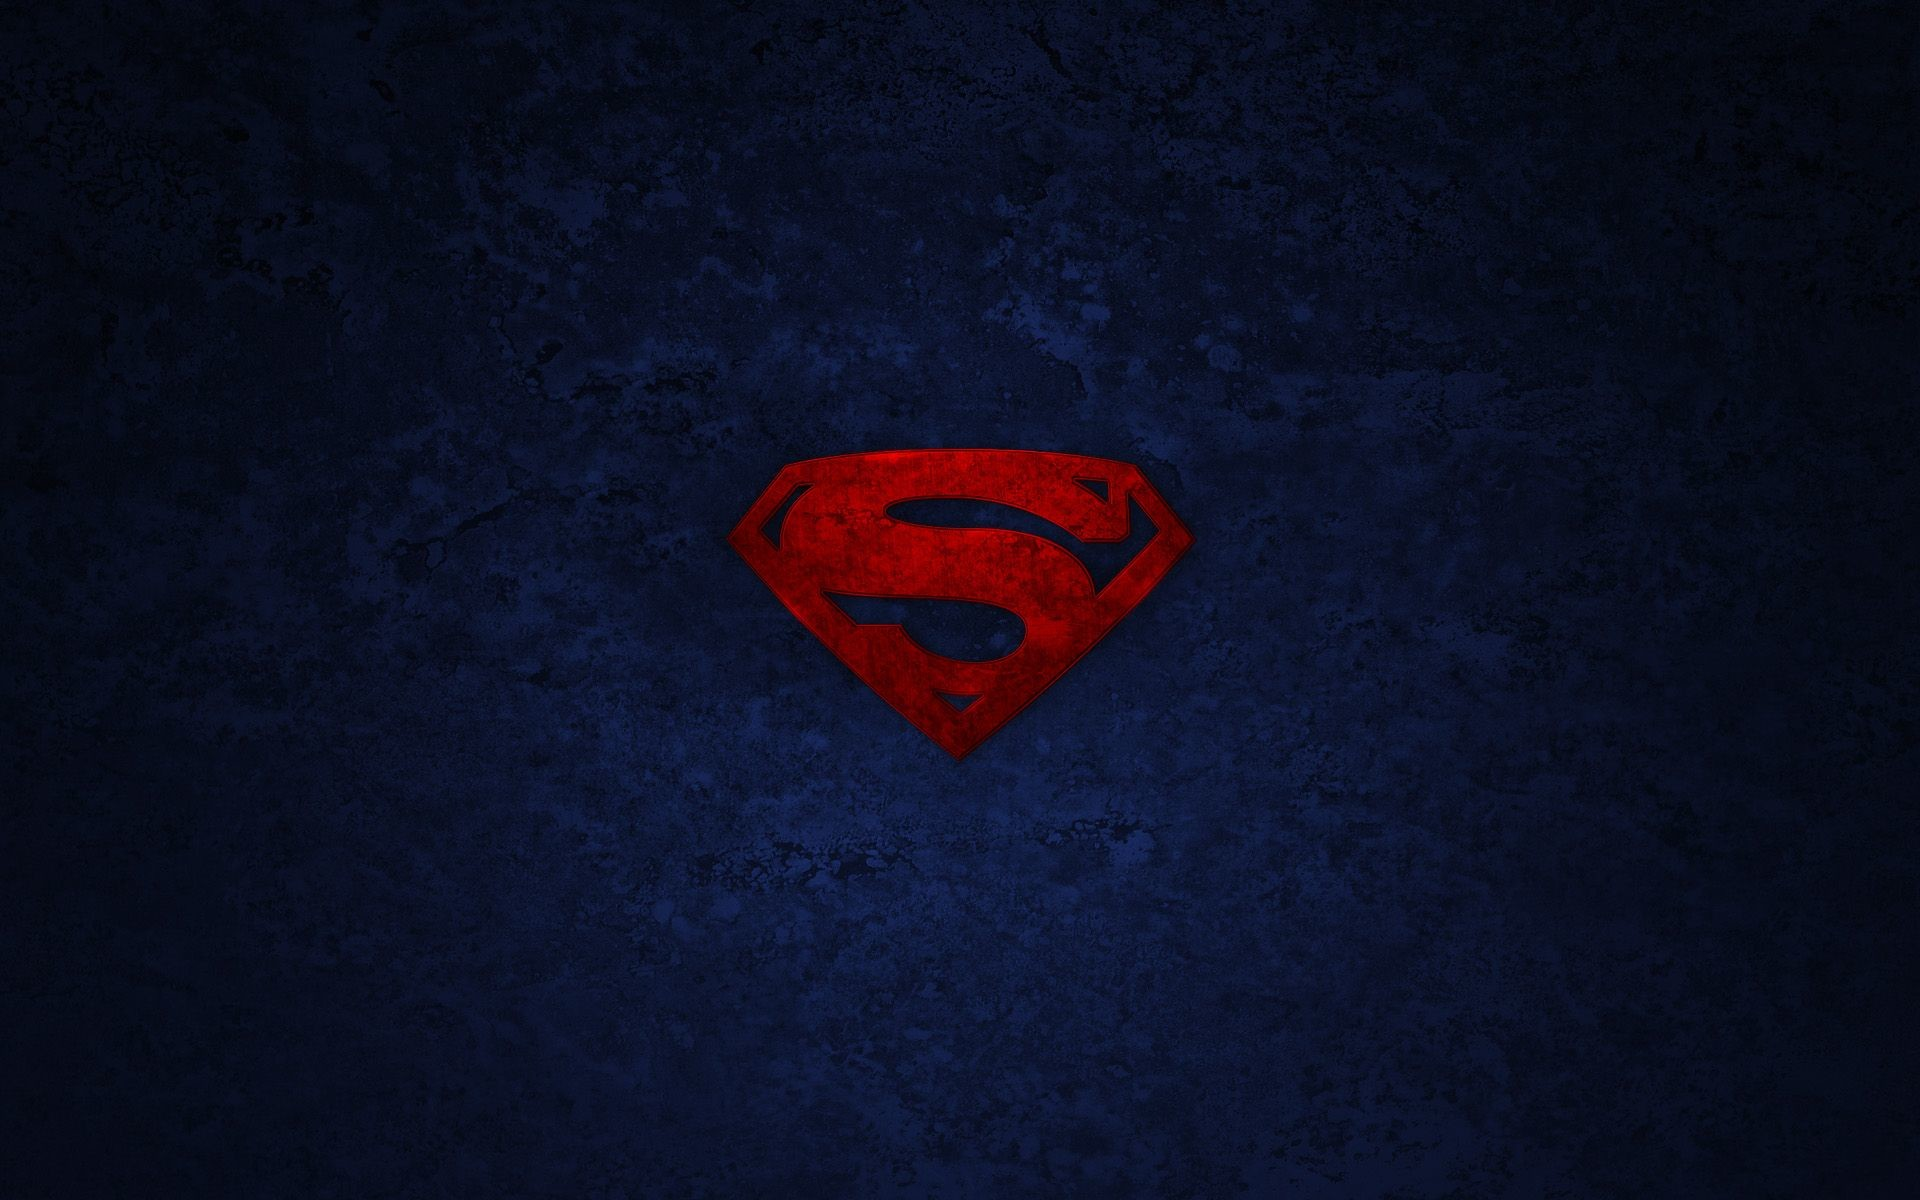 Superman red logo desktop wallpaper 660